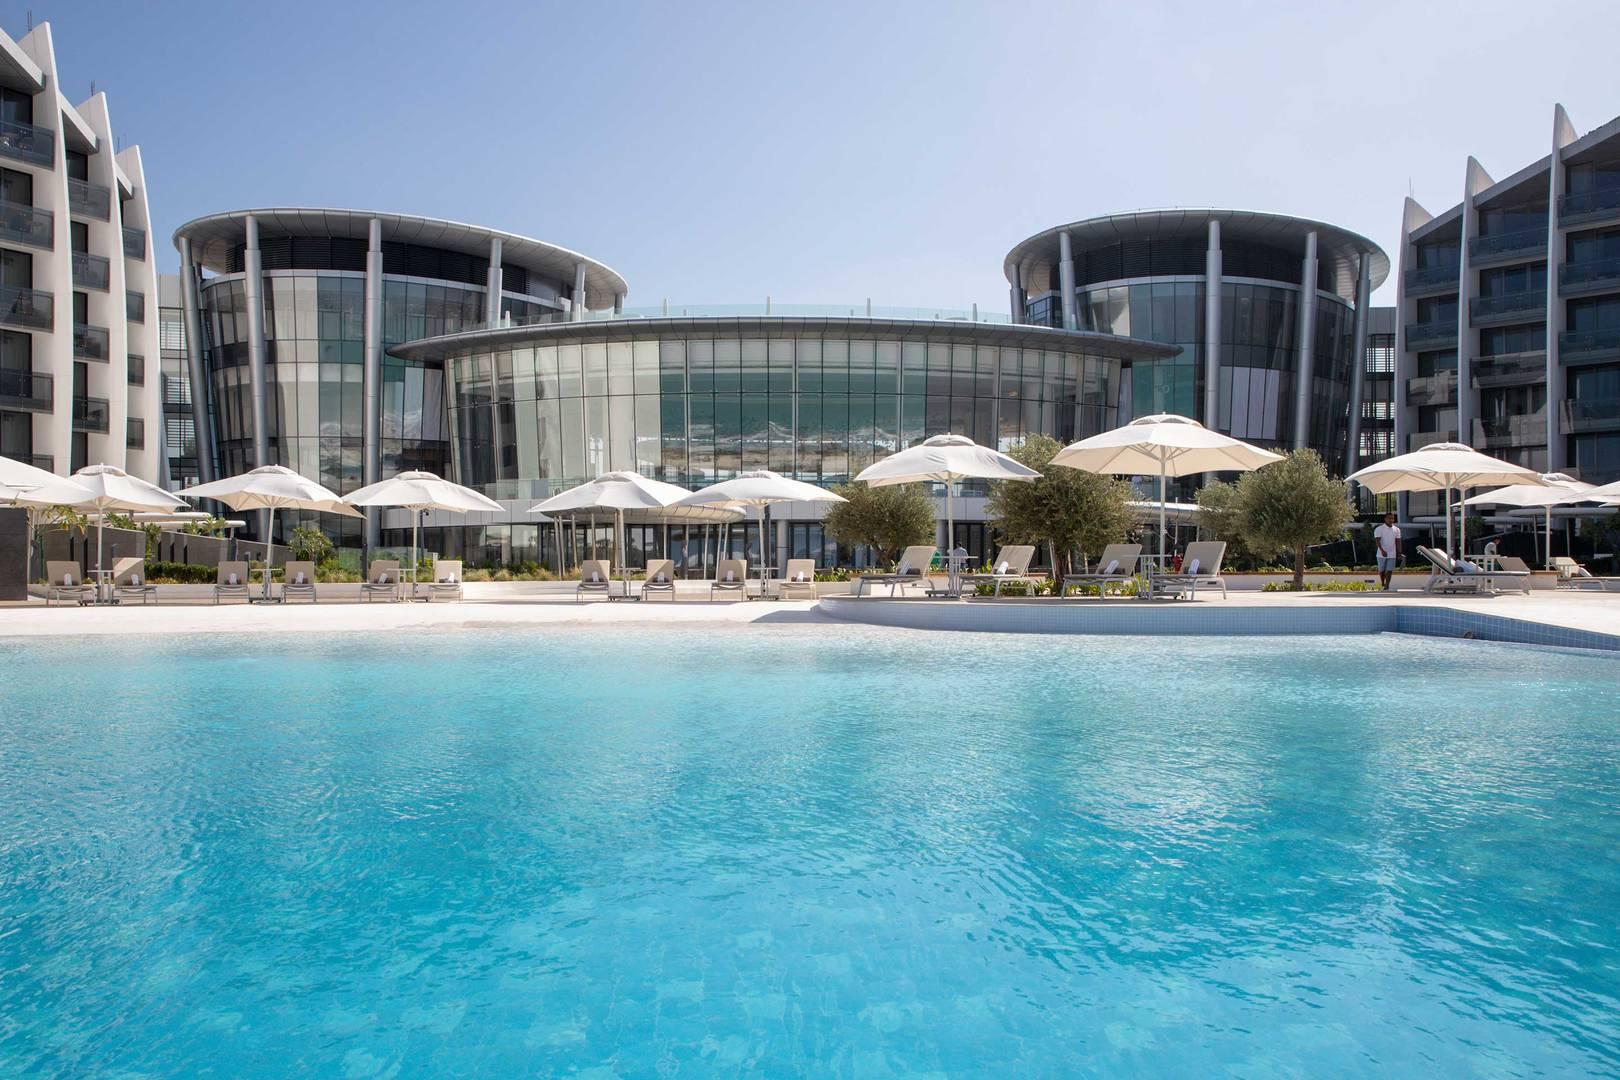 Front view of the Jumeirah Saadiyat Island Resort